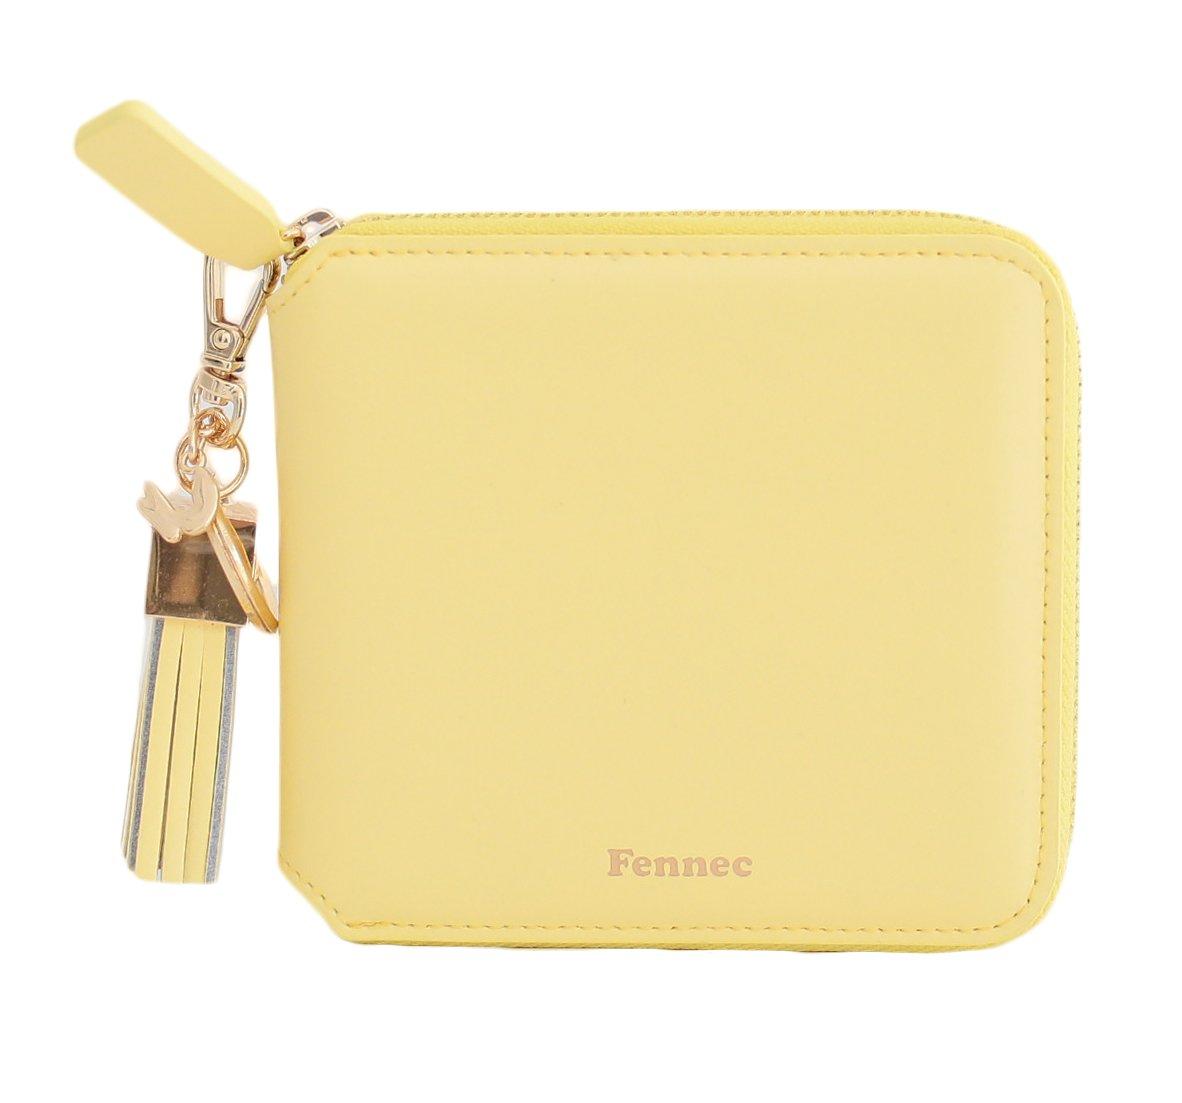 Fennec Zipper Wallet Square Tassel フェネック 二つ折り財布 コインケース付き 【Fennec OFFICIAL】 B0765NH47V メロウイエロー メロウイエロー